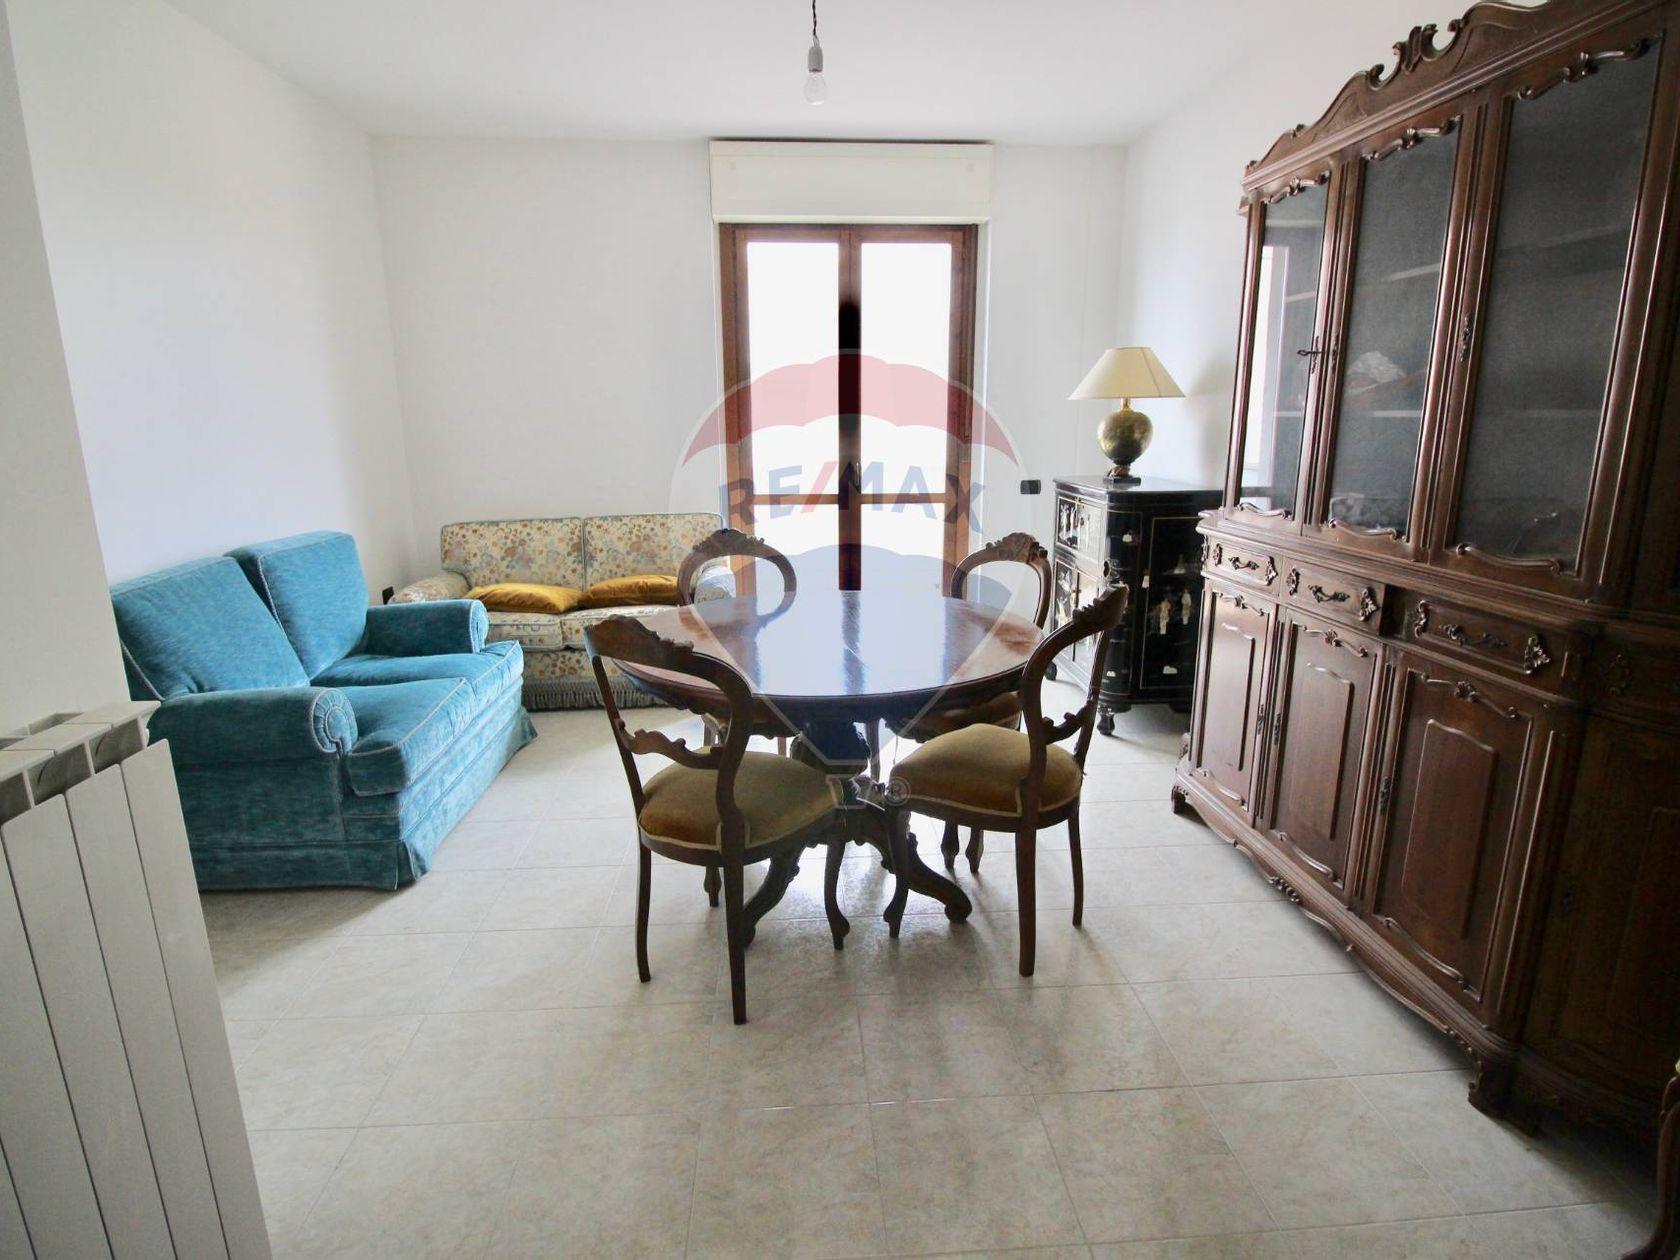 Appartamento Ss-s. Orsola Storica, Sassari, SS Vendita - Foto 2